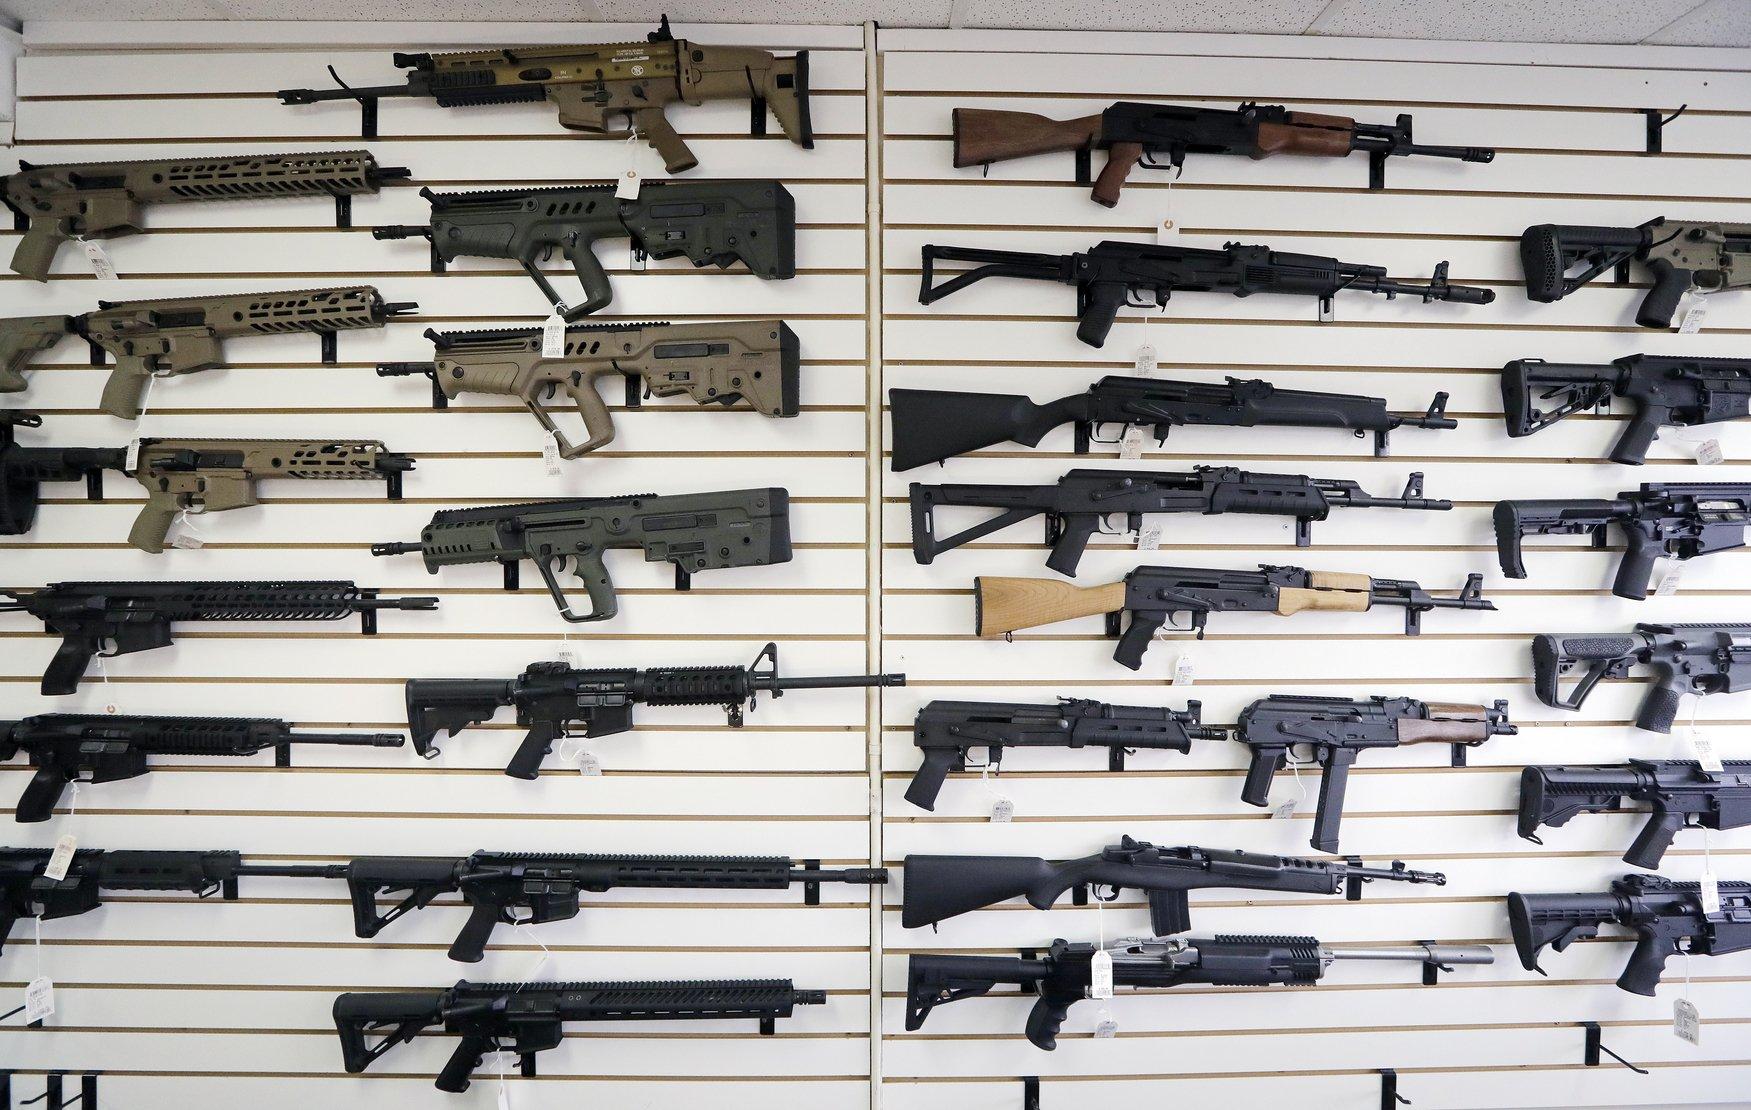 Washington bans anyone under 21 from buying assault rifles